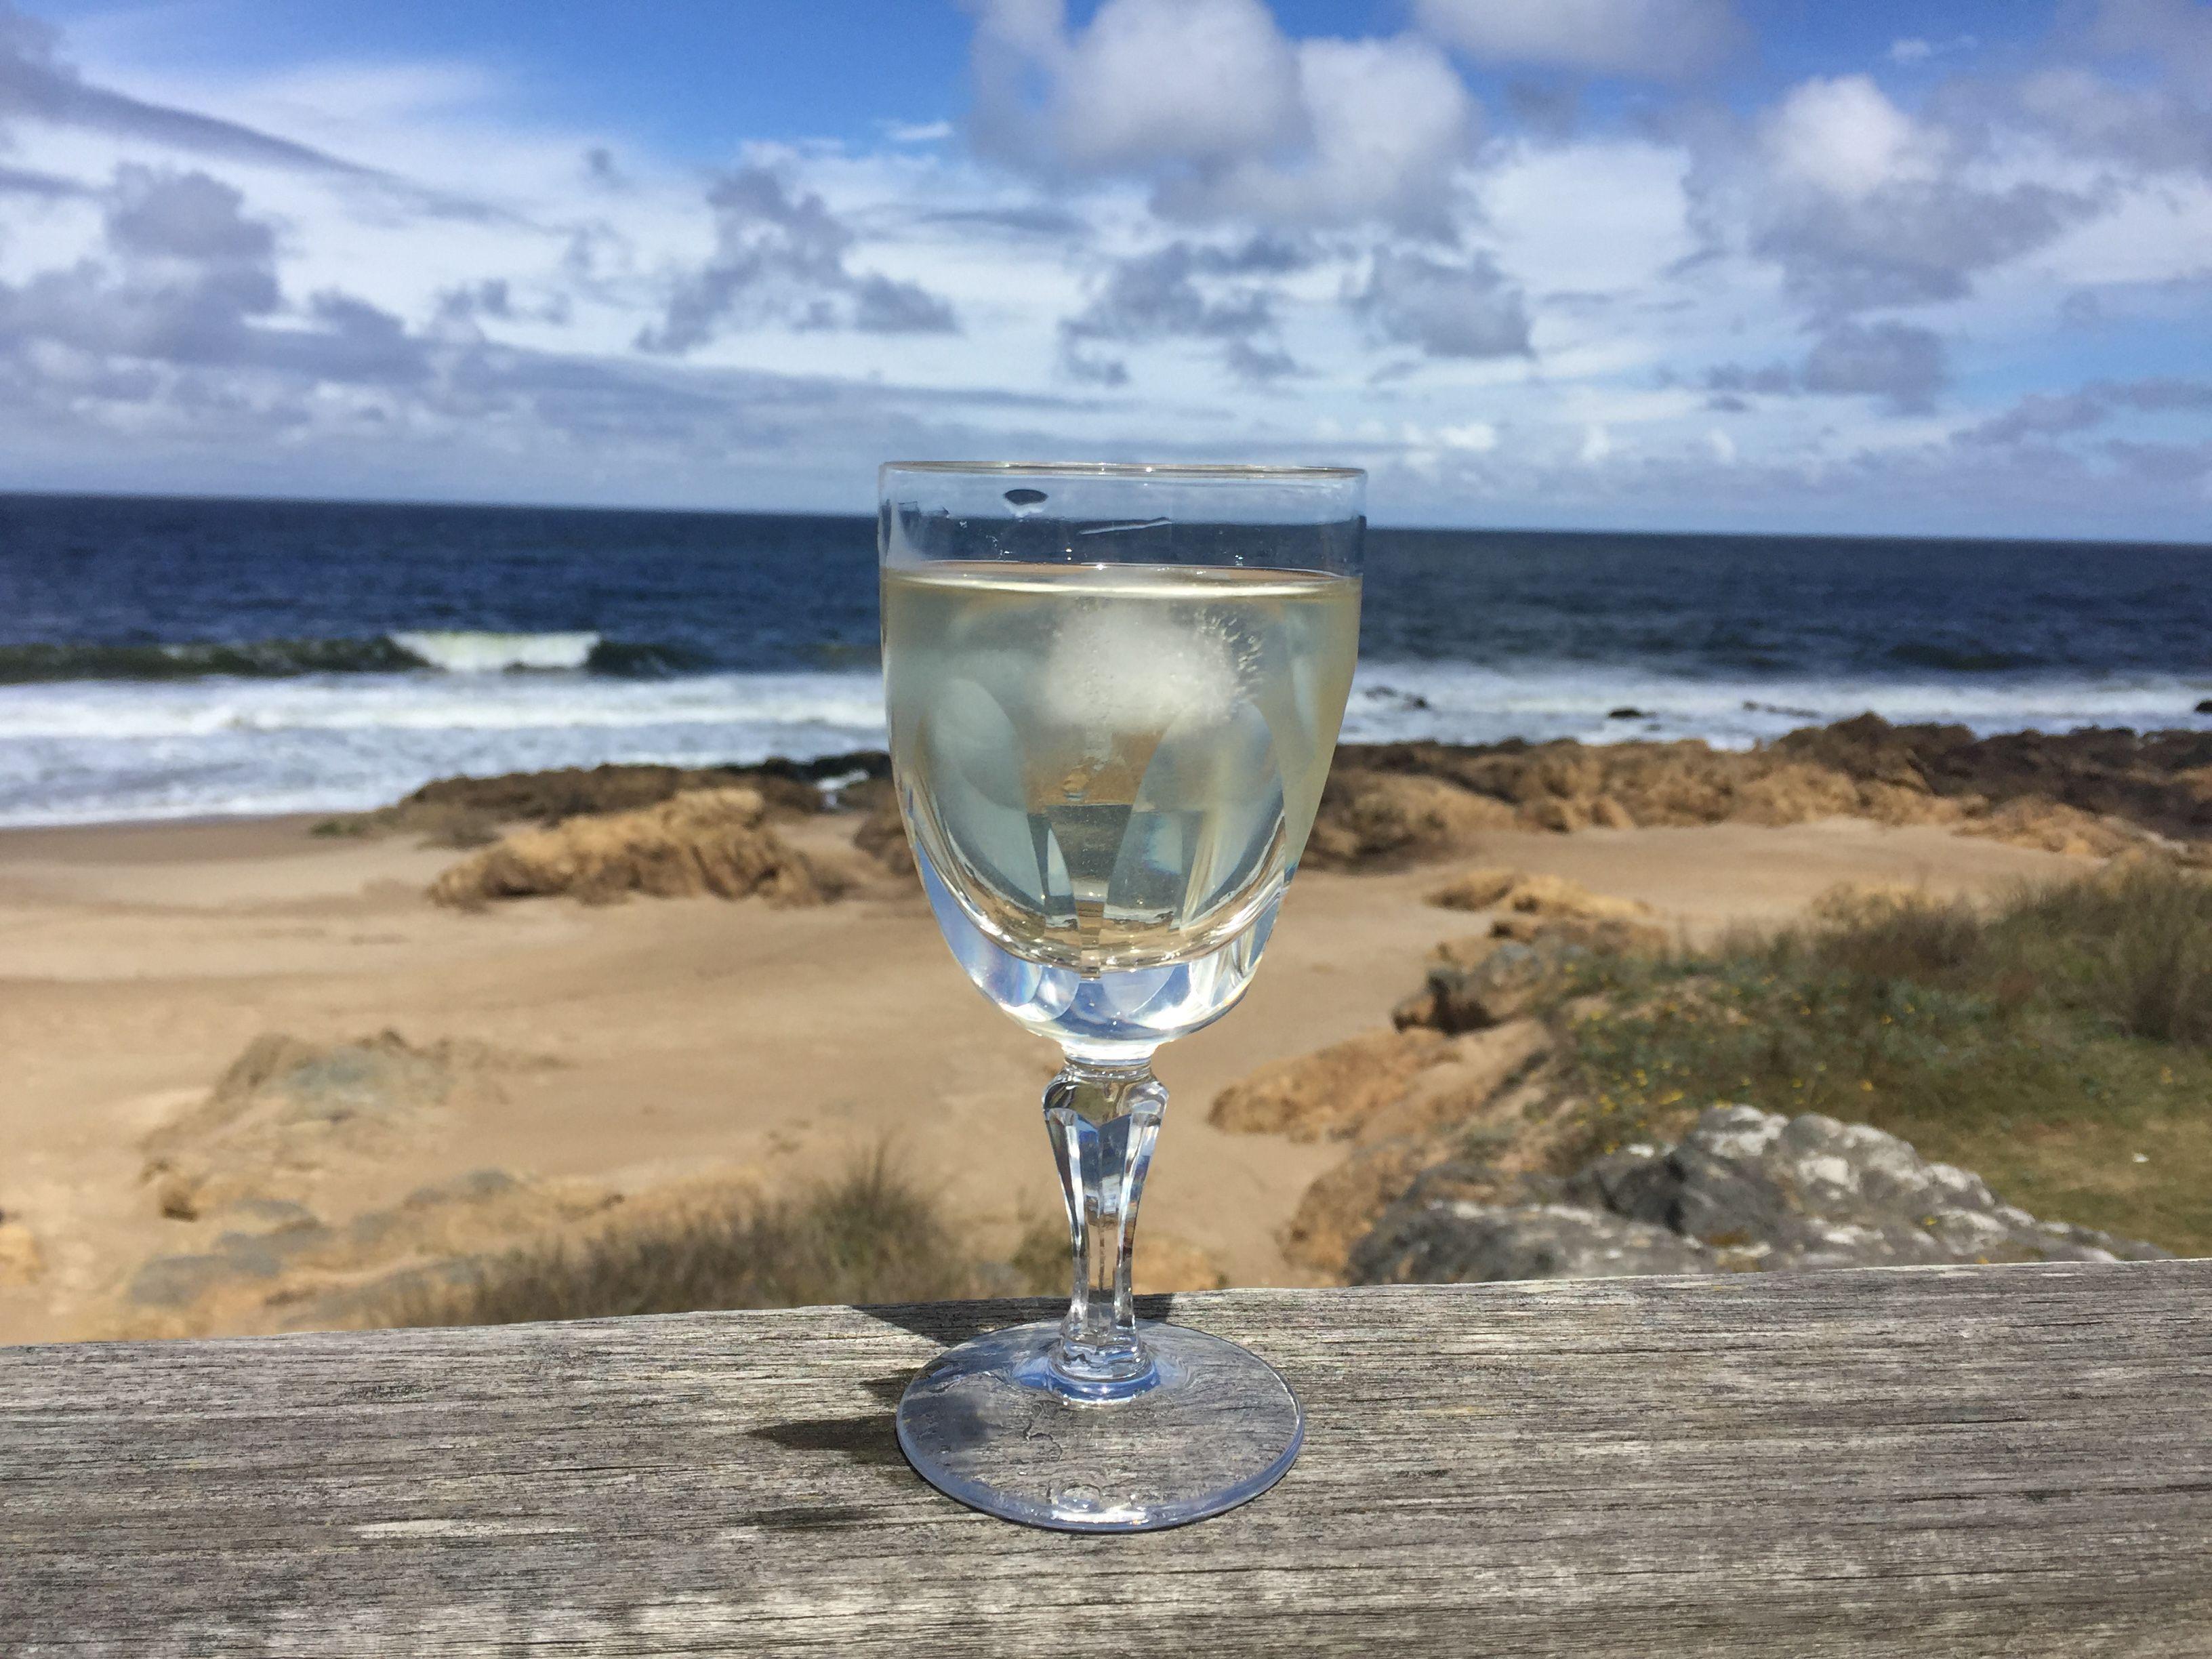 Copa De Vino Blanco Cristal Deco Summerdeco Party  # Champagne Muebles Uy